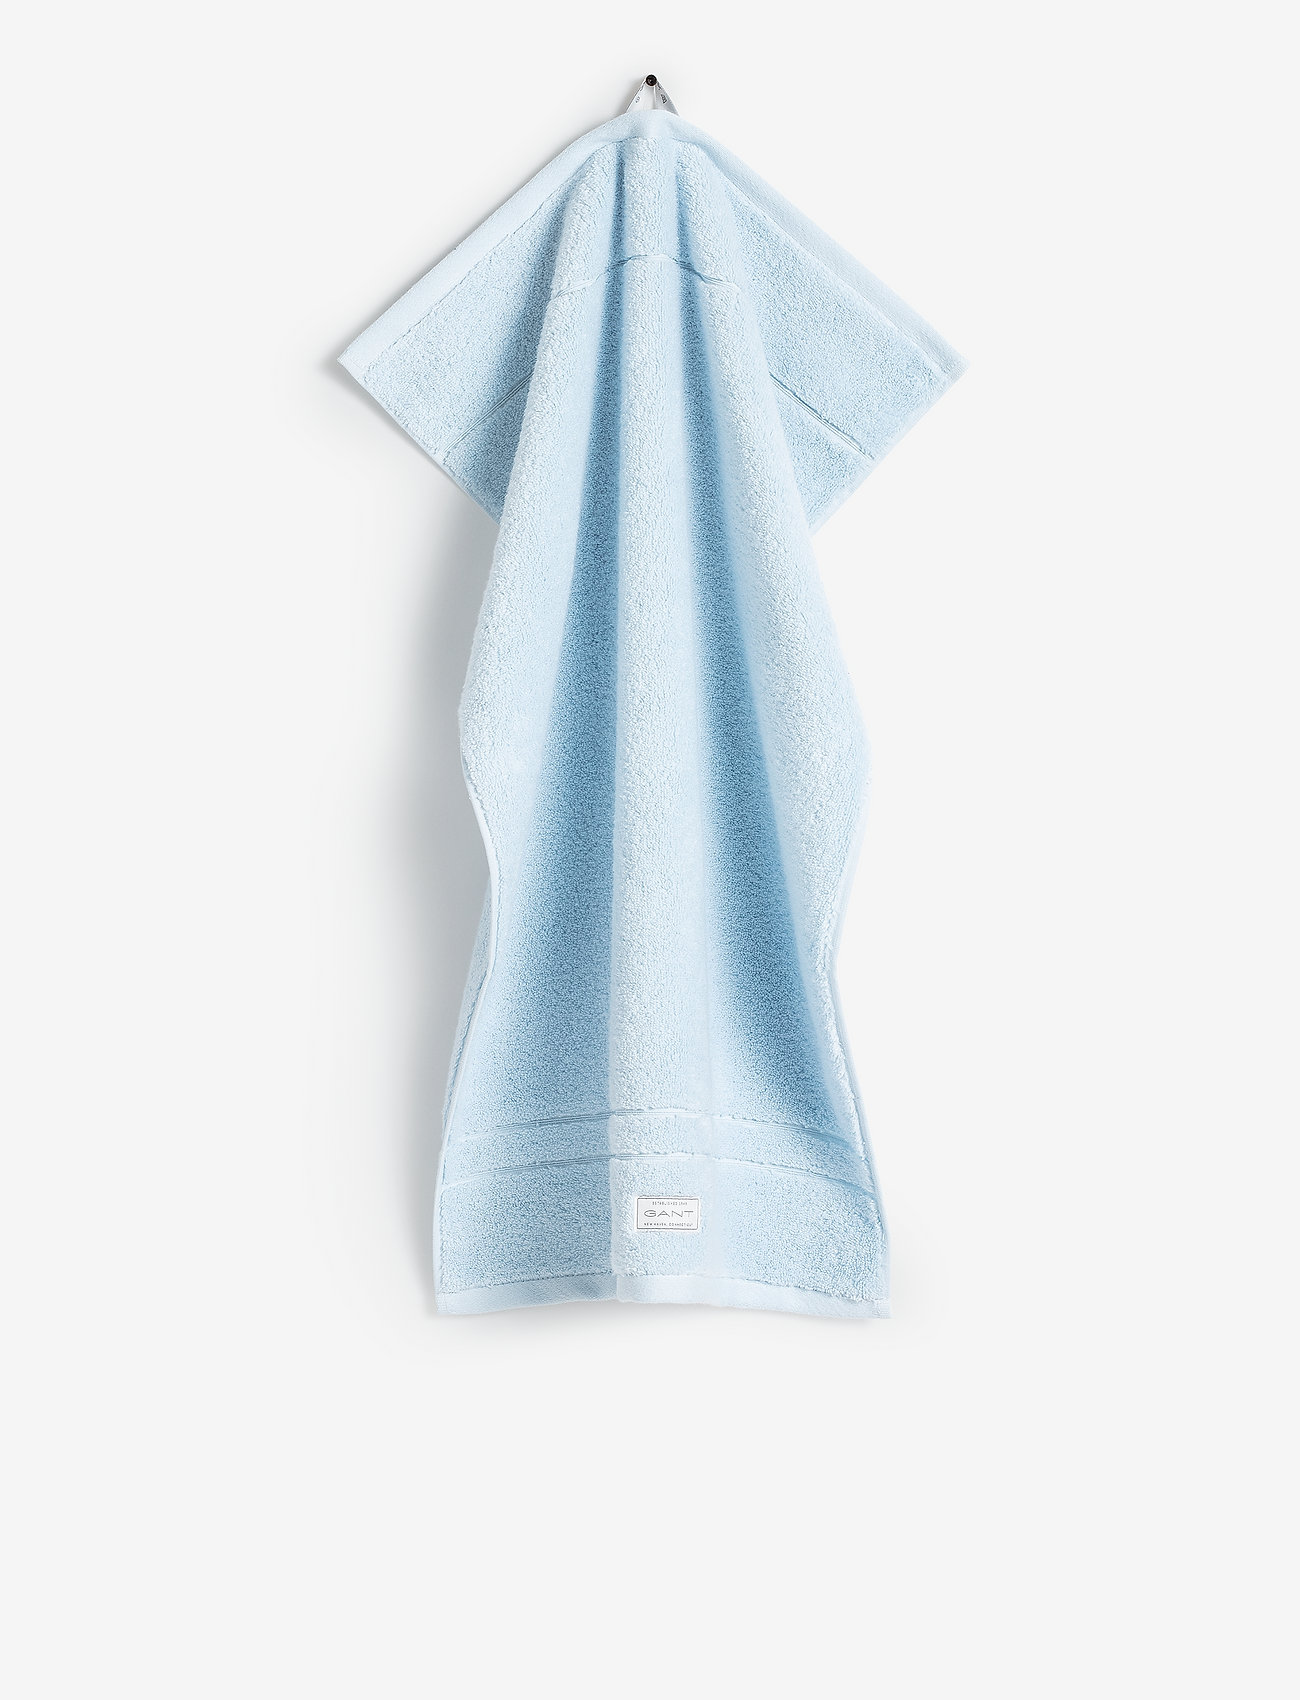 GANT - PREMIUM TOWEL 70X140 - hand towels & bath towels - pacific blue - 0